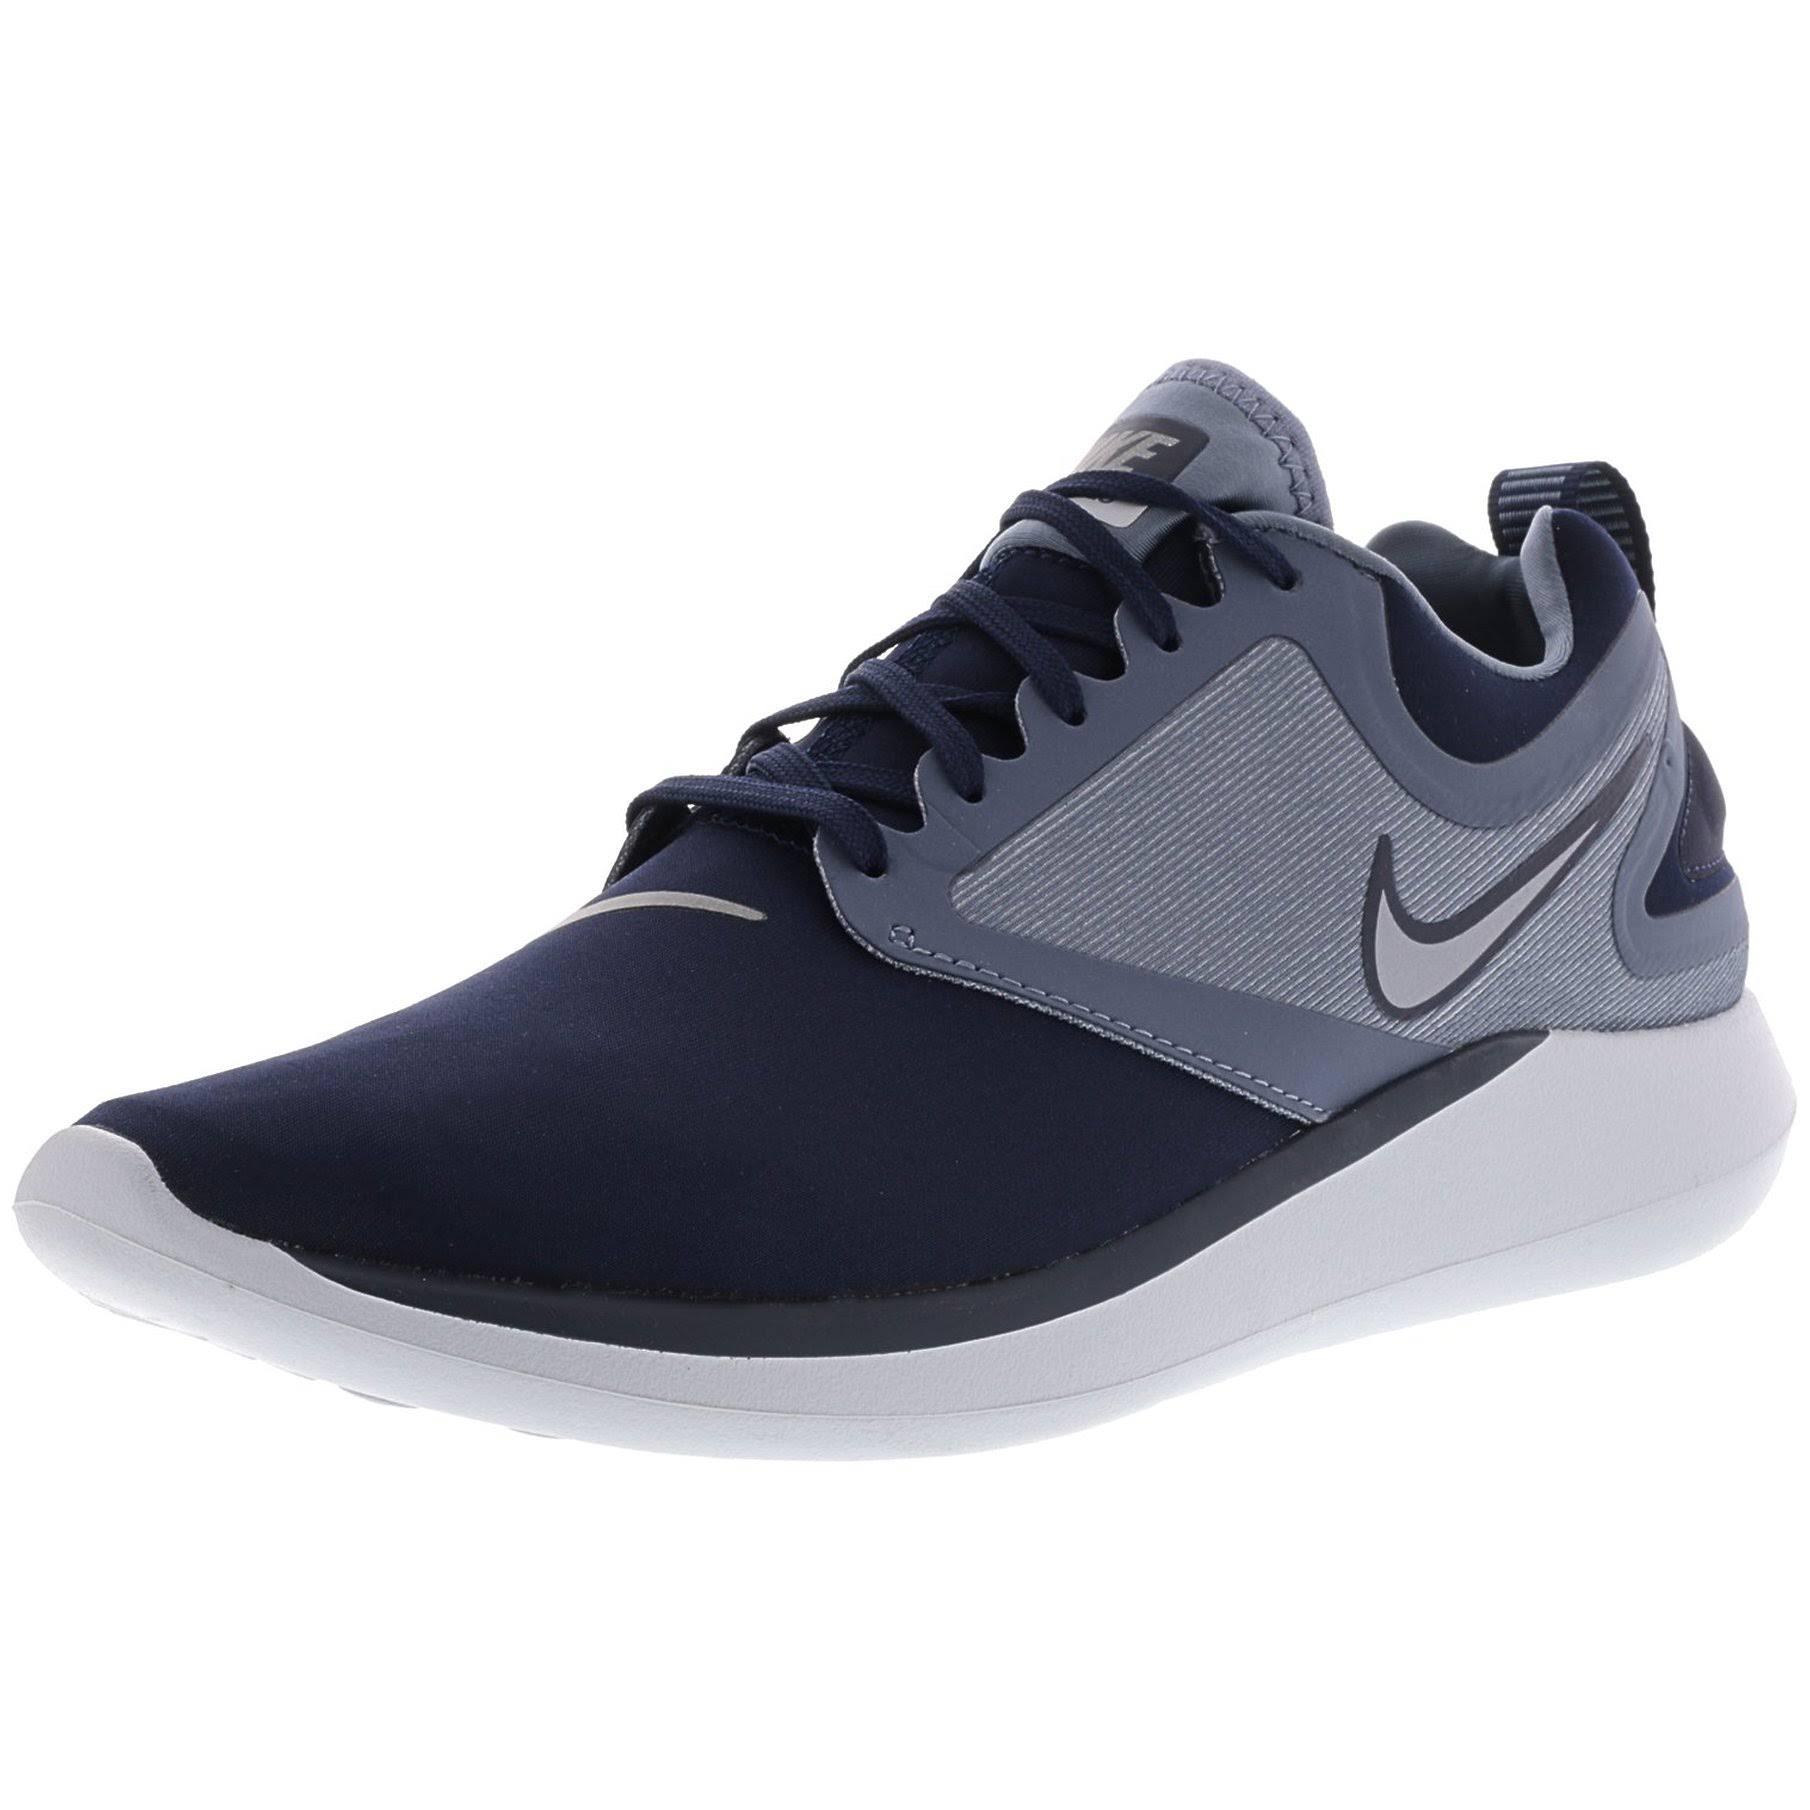 Nike Herren Herren Lunarsolo Sneakers Nike Lunarsolo Lunarsolo Sneakers Laufschuhe Herren Nike Laufschuhe Laufschuhe Nike Sneakers xUvdwqv5